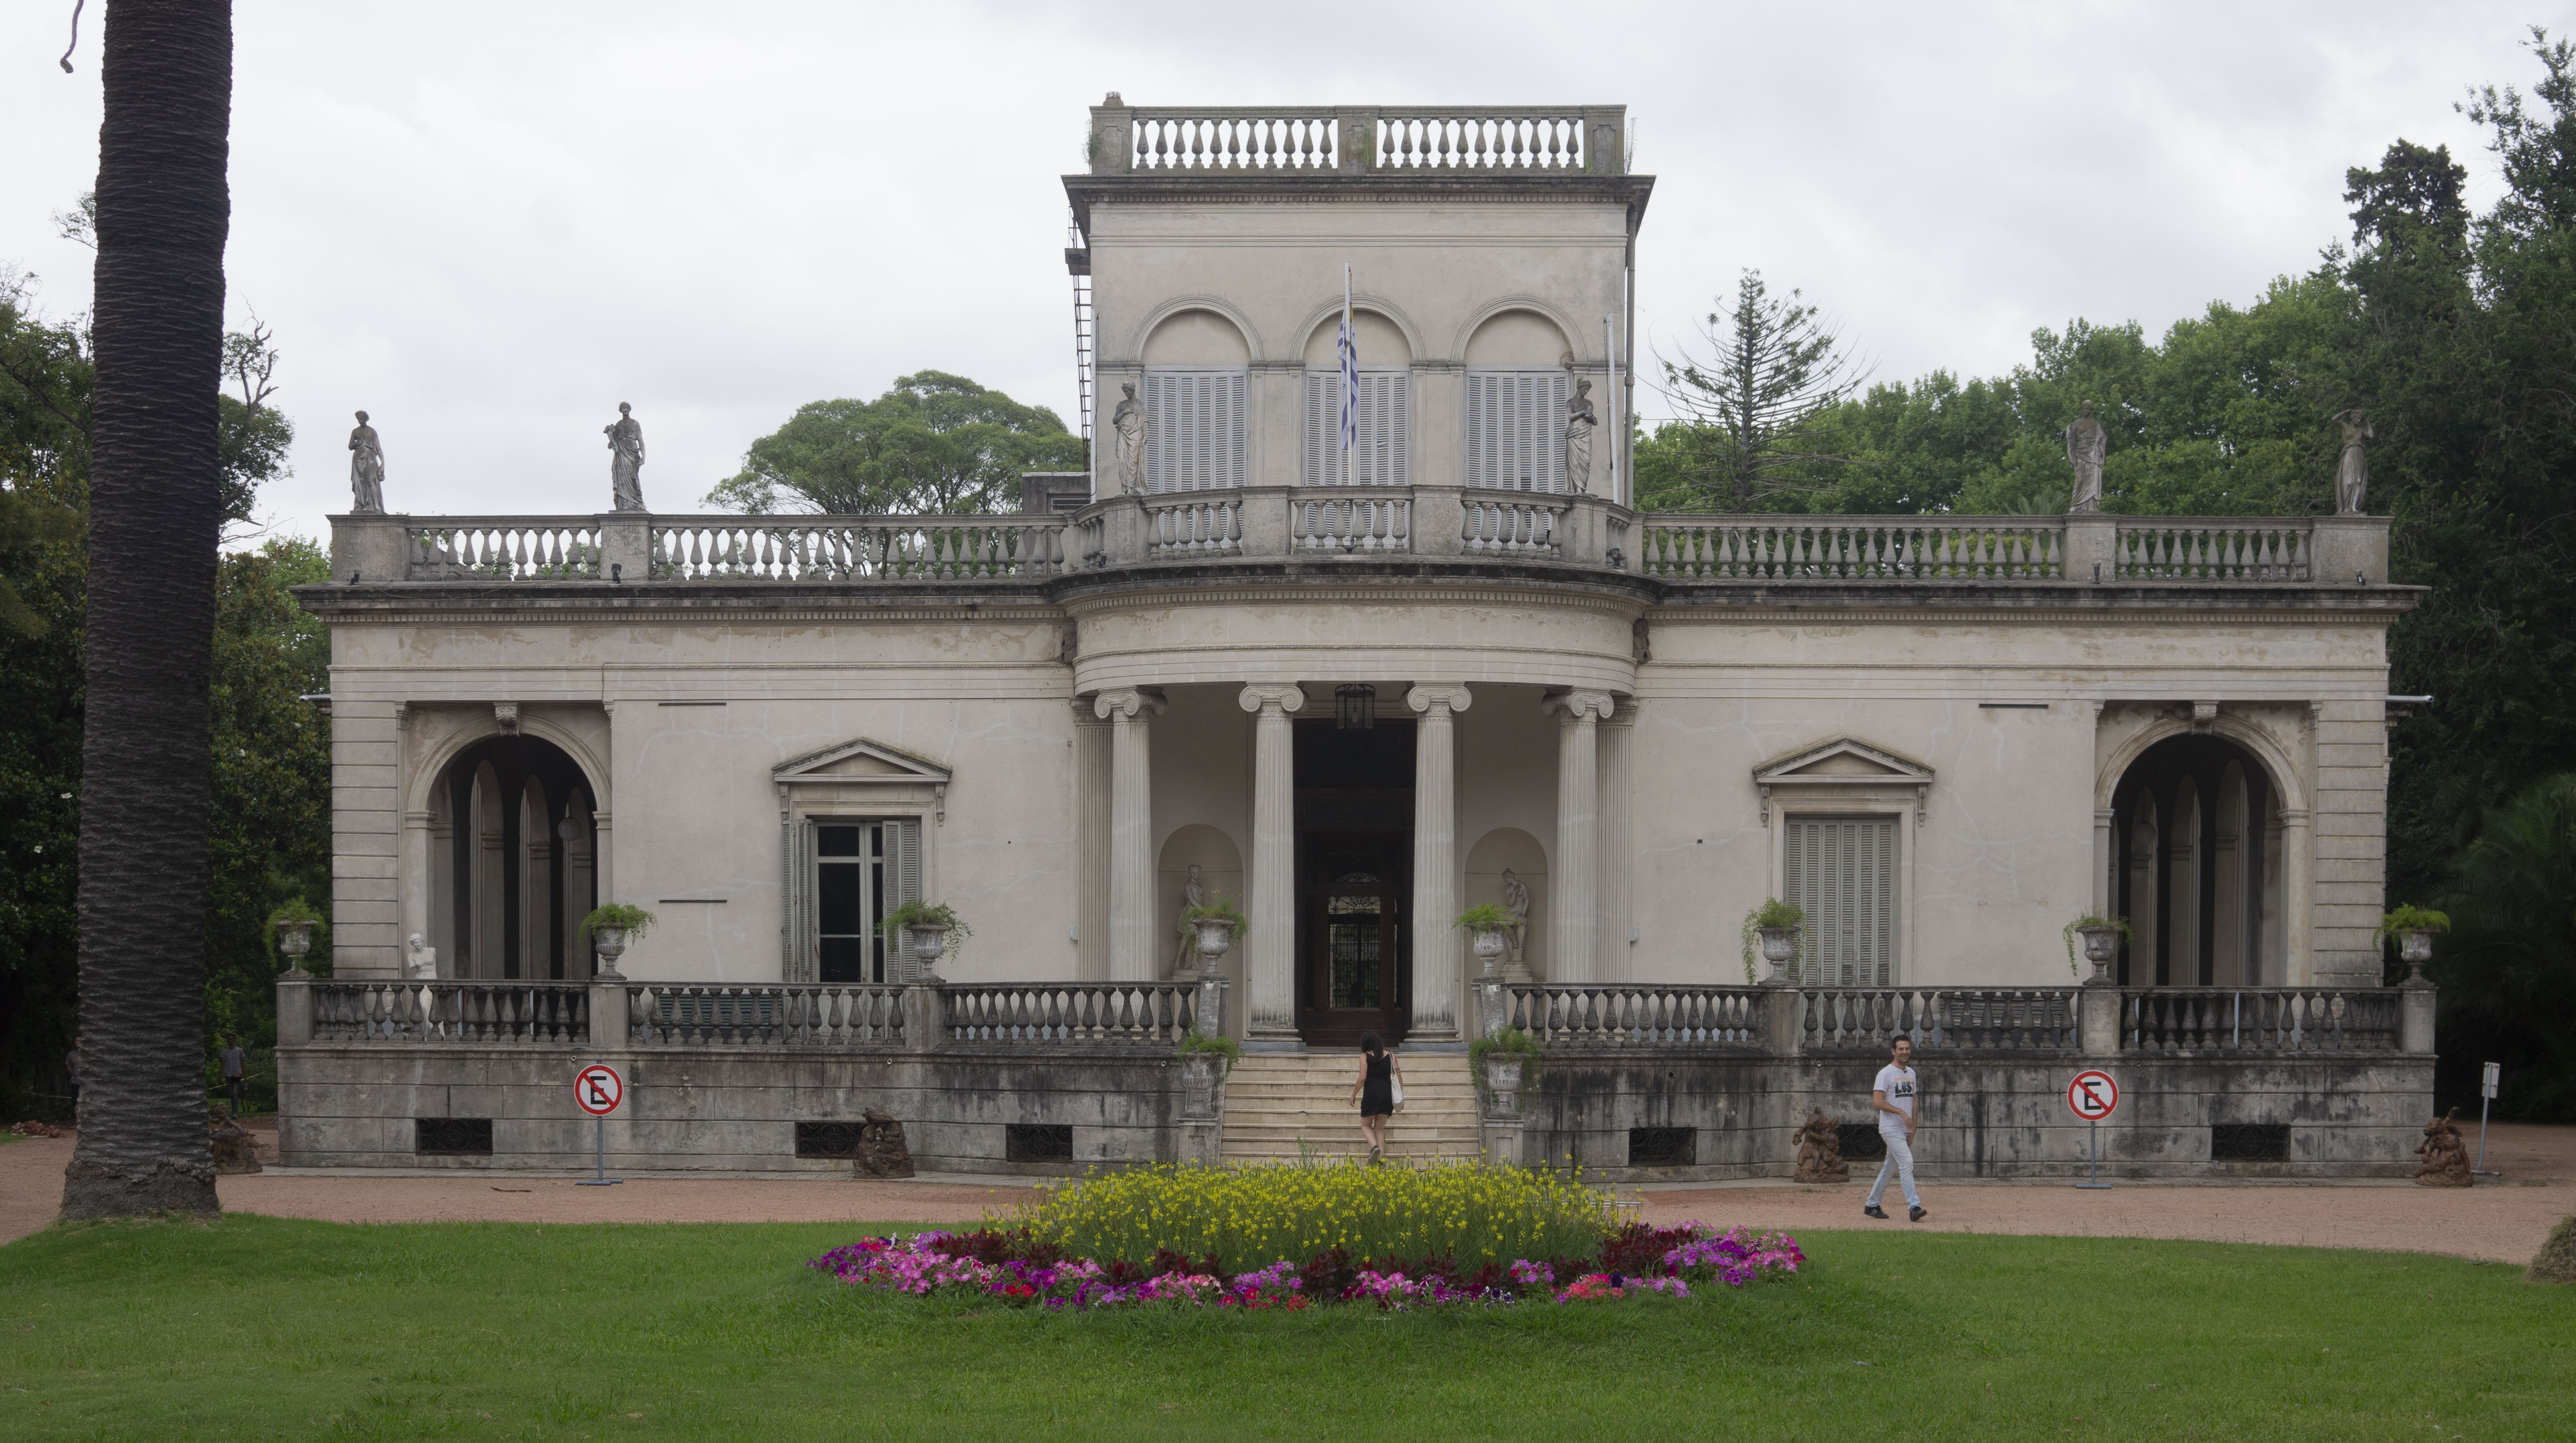 Museo Juan Manuel Blanes - Wikipedia, la enciclopedia libre